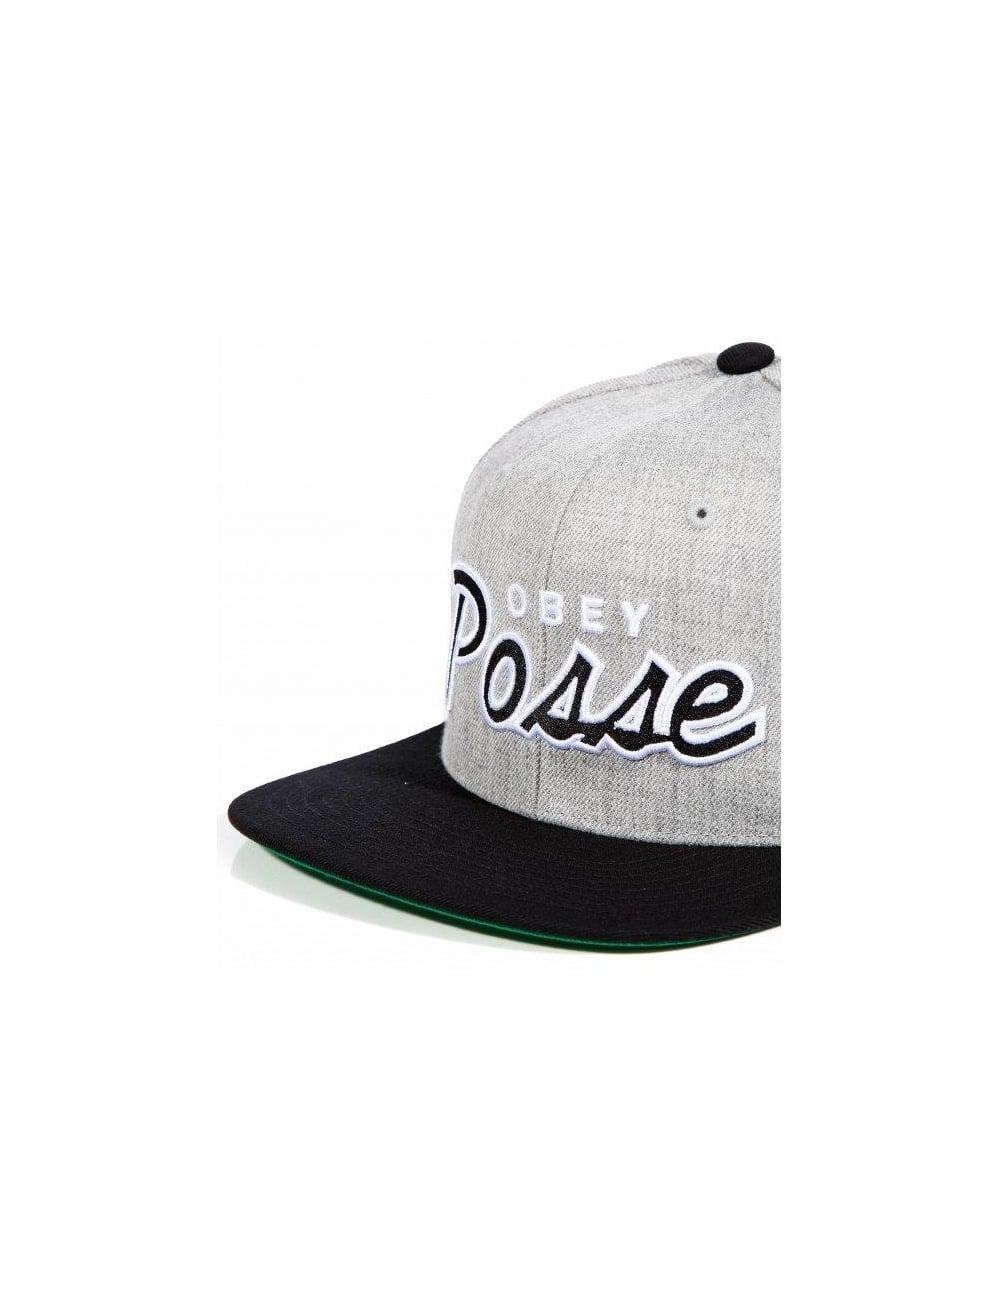 6ac3628cc94 Obey Clothing Obey Posse Snapback - Heather Grey Black - Hat Shop ...